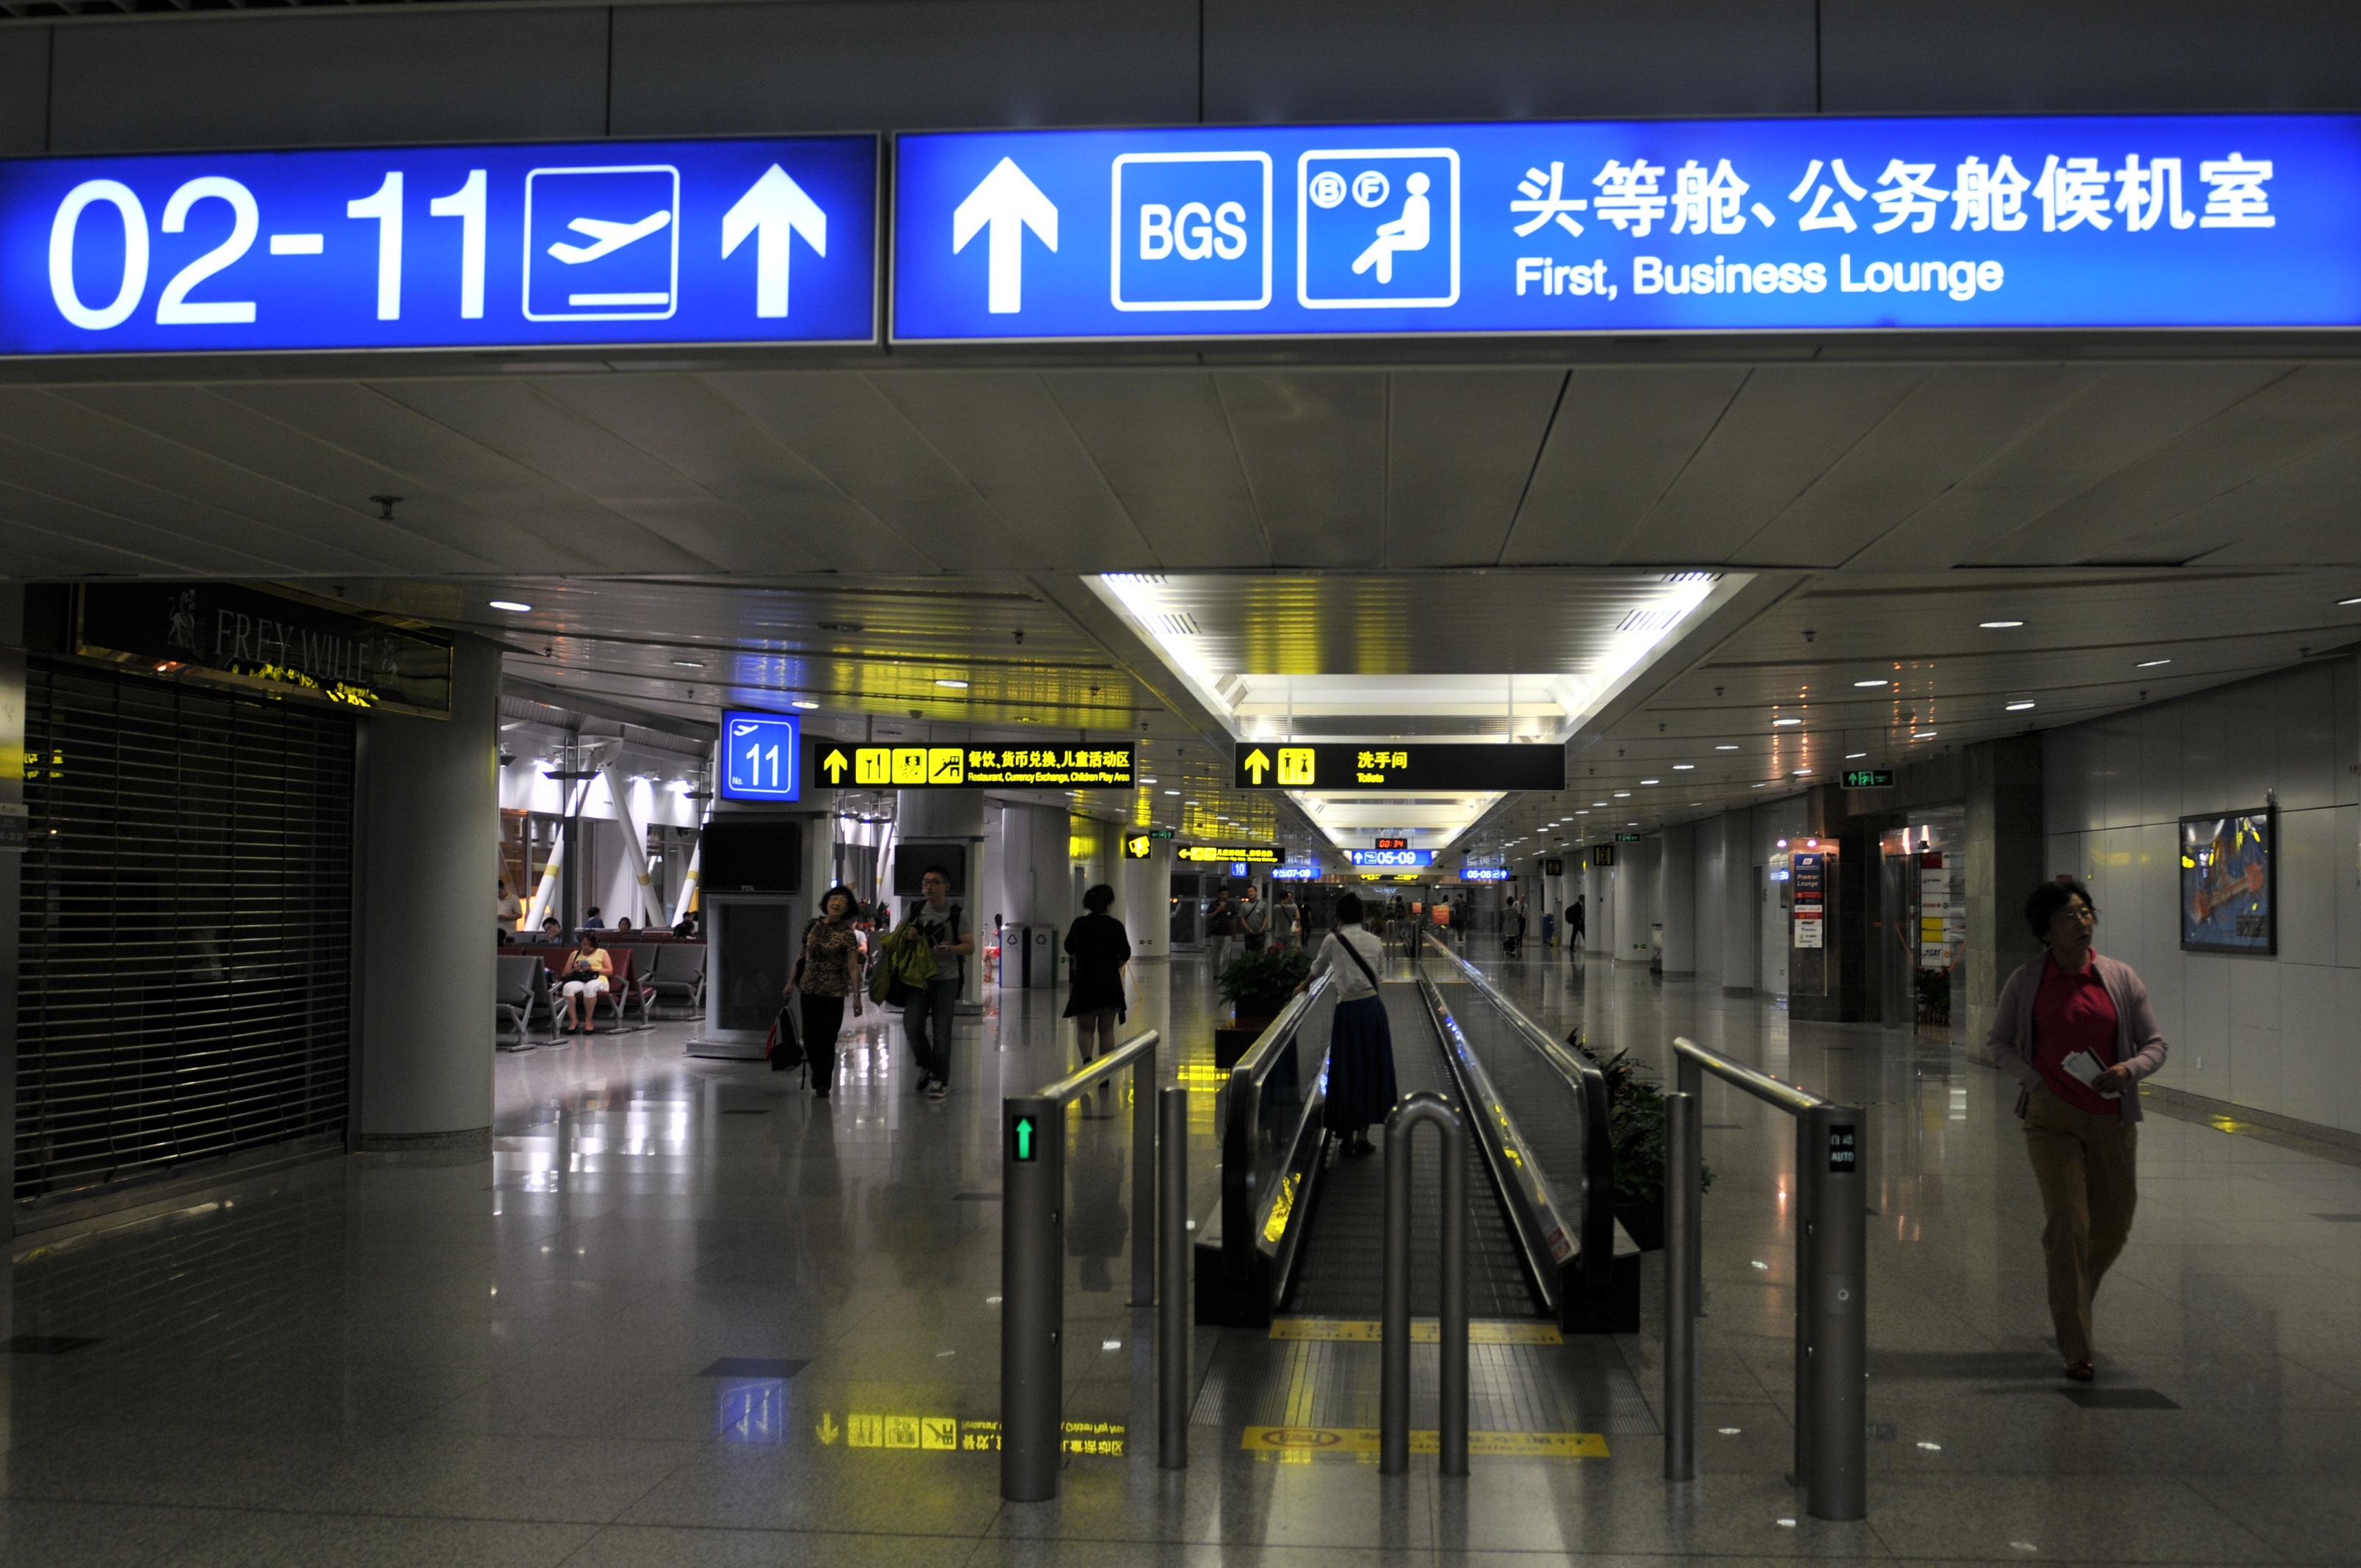 File:中国北京首都国际机场 China Beijing Capital International Airport - panoramio  (12).jpg - Wikimedia Commons